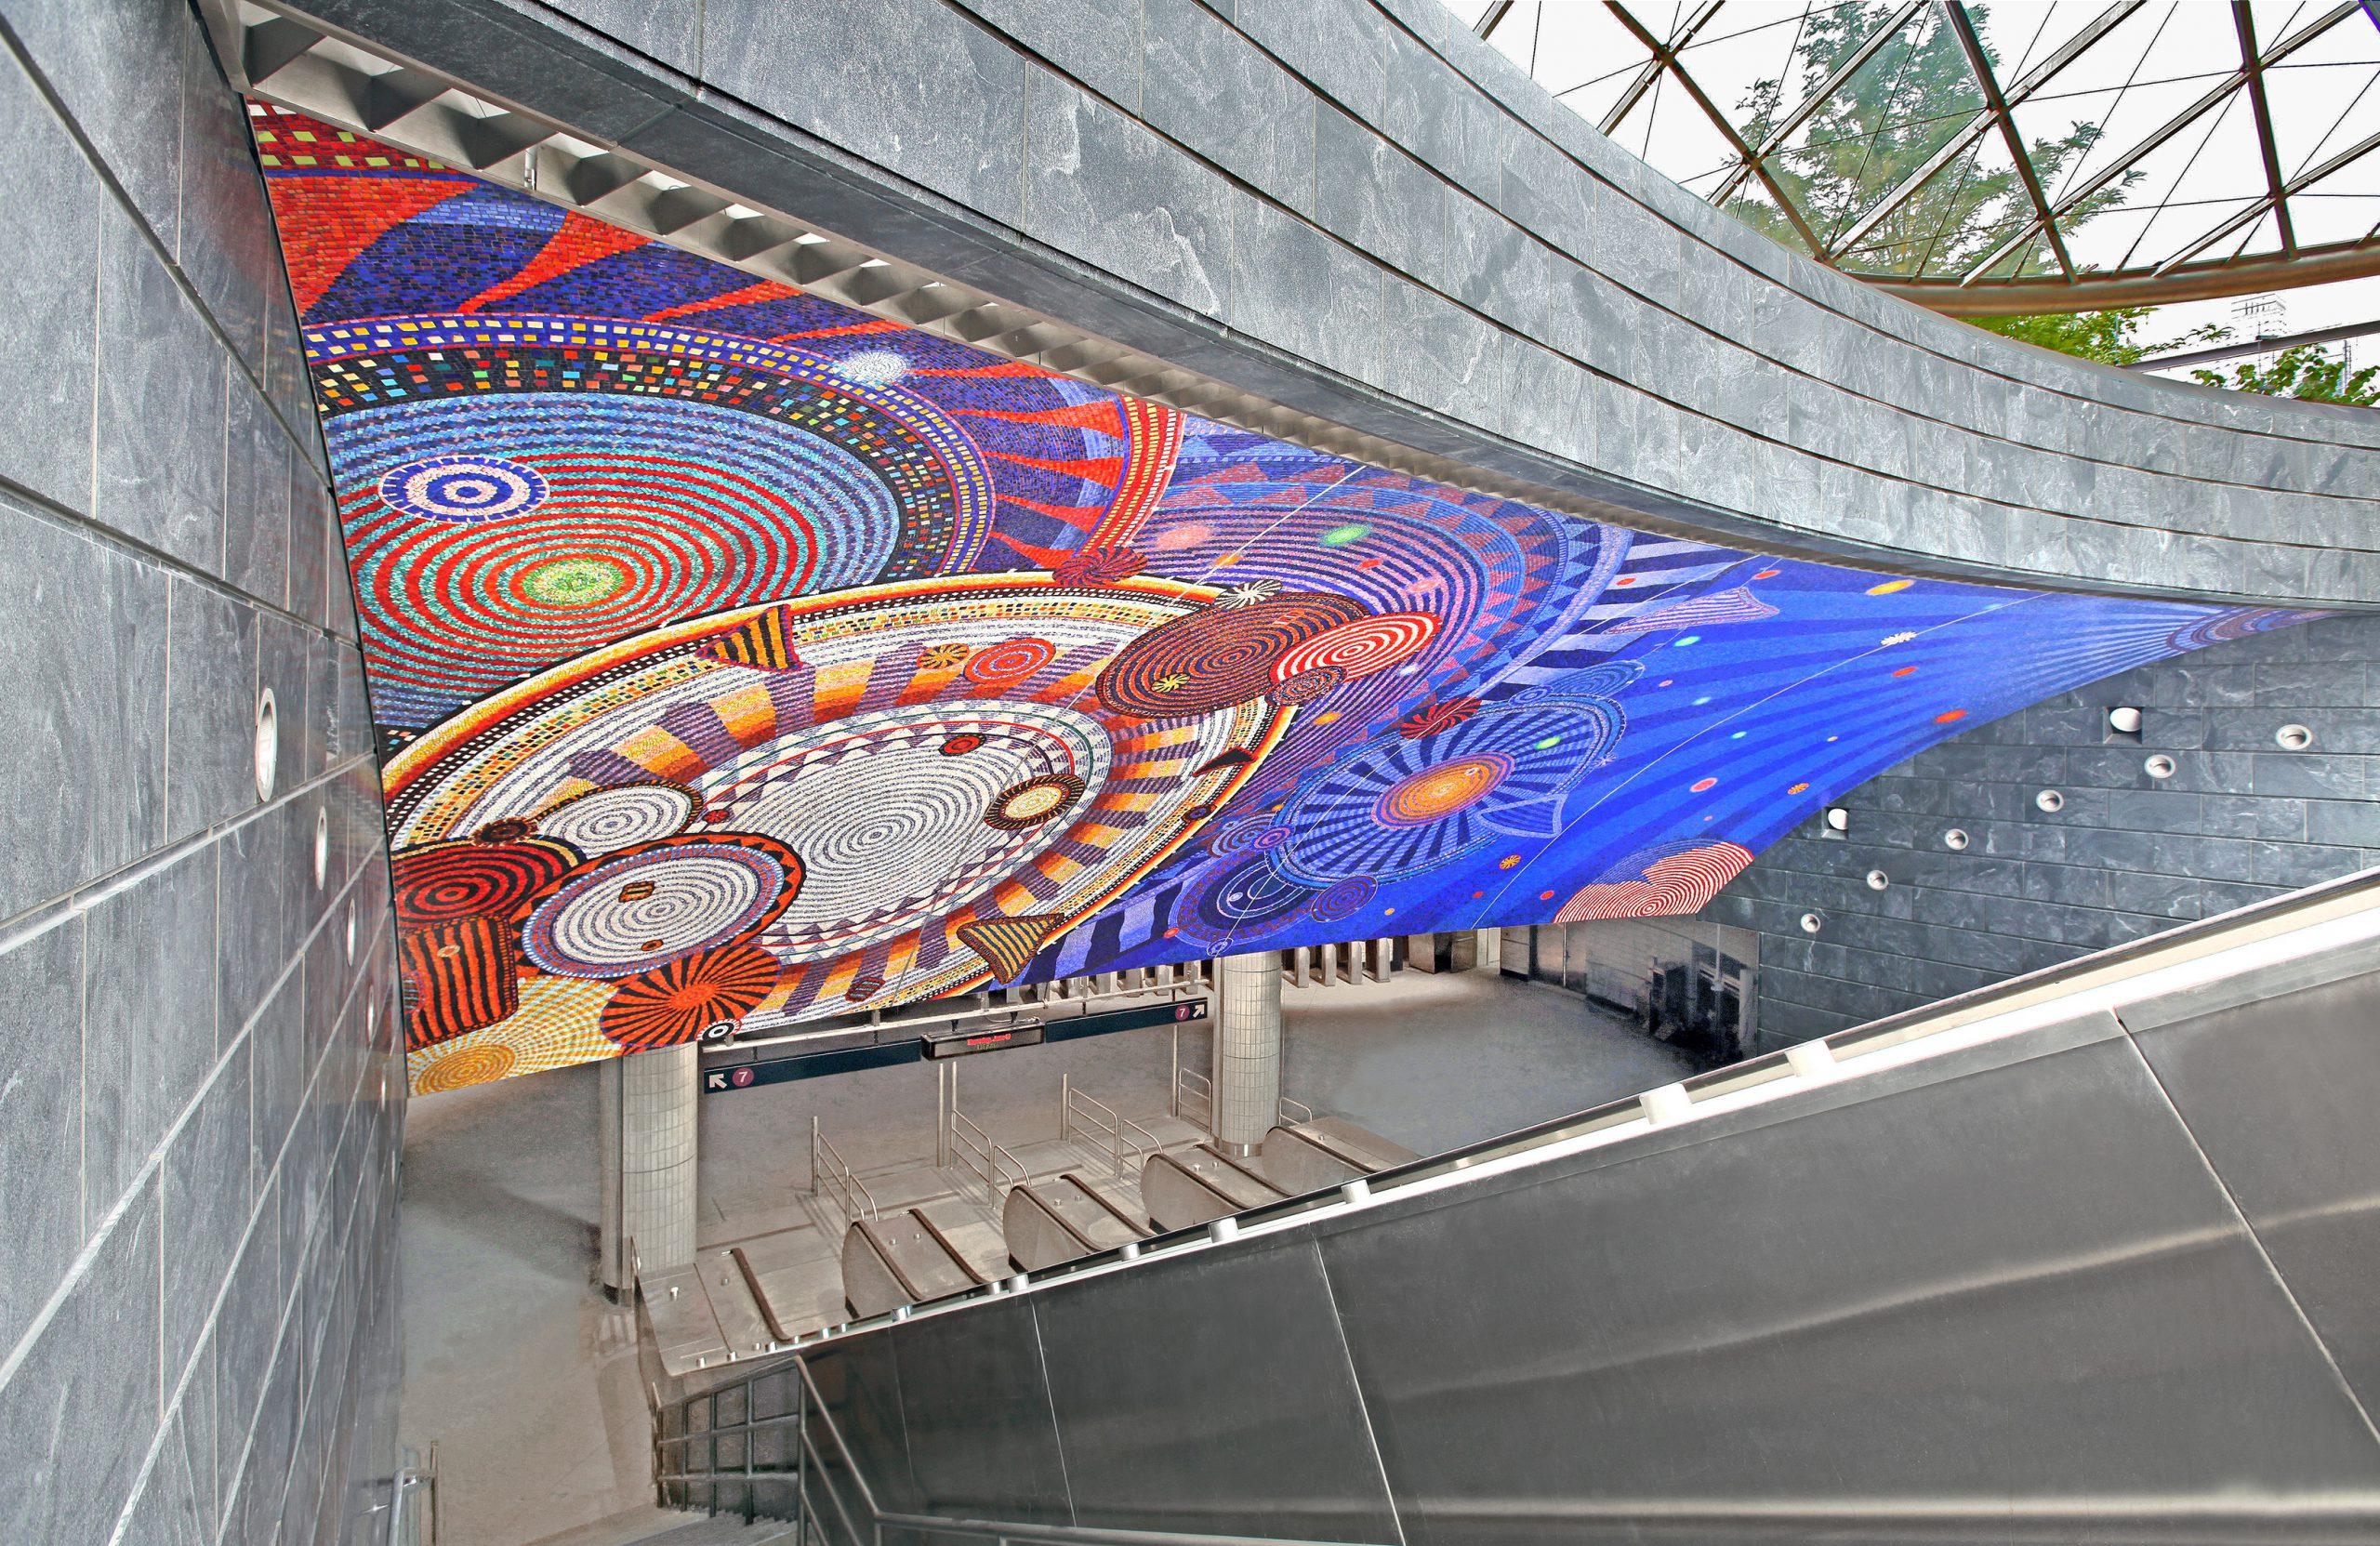 7 West Subway Entrance Mosaic Mural by Xenobia Bailey: Photo Credit: Rob Wilson, 2015